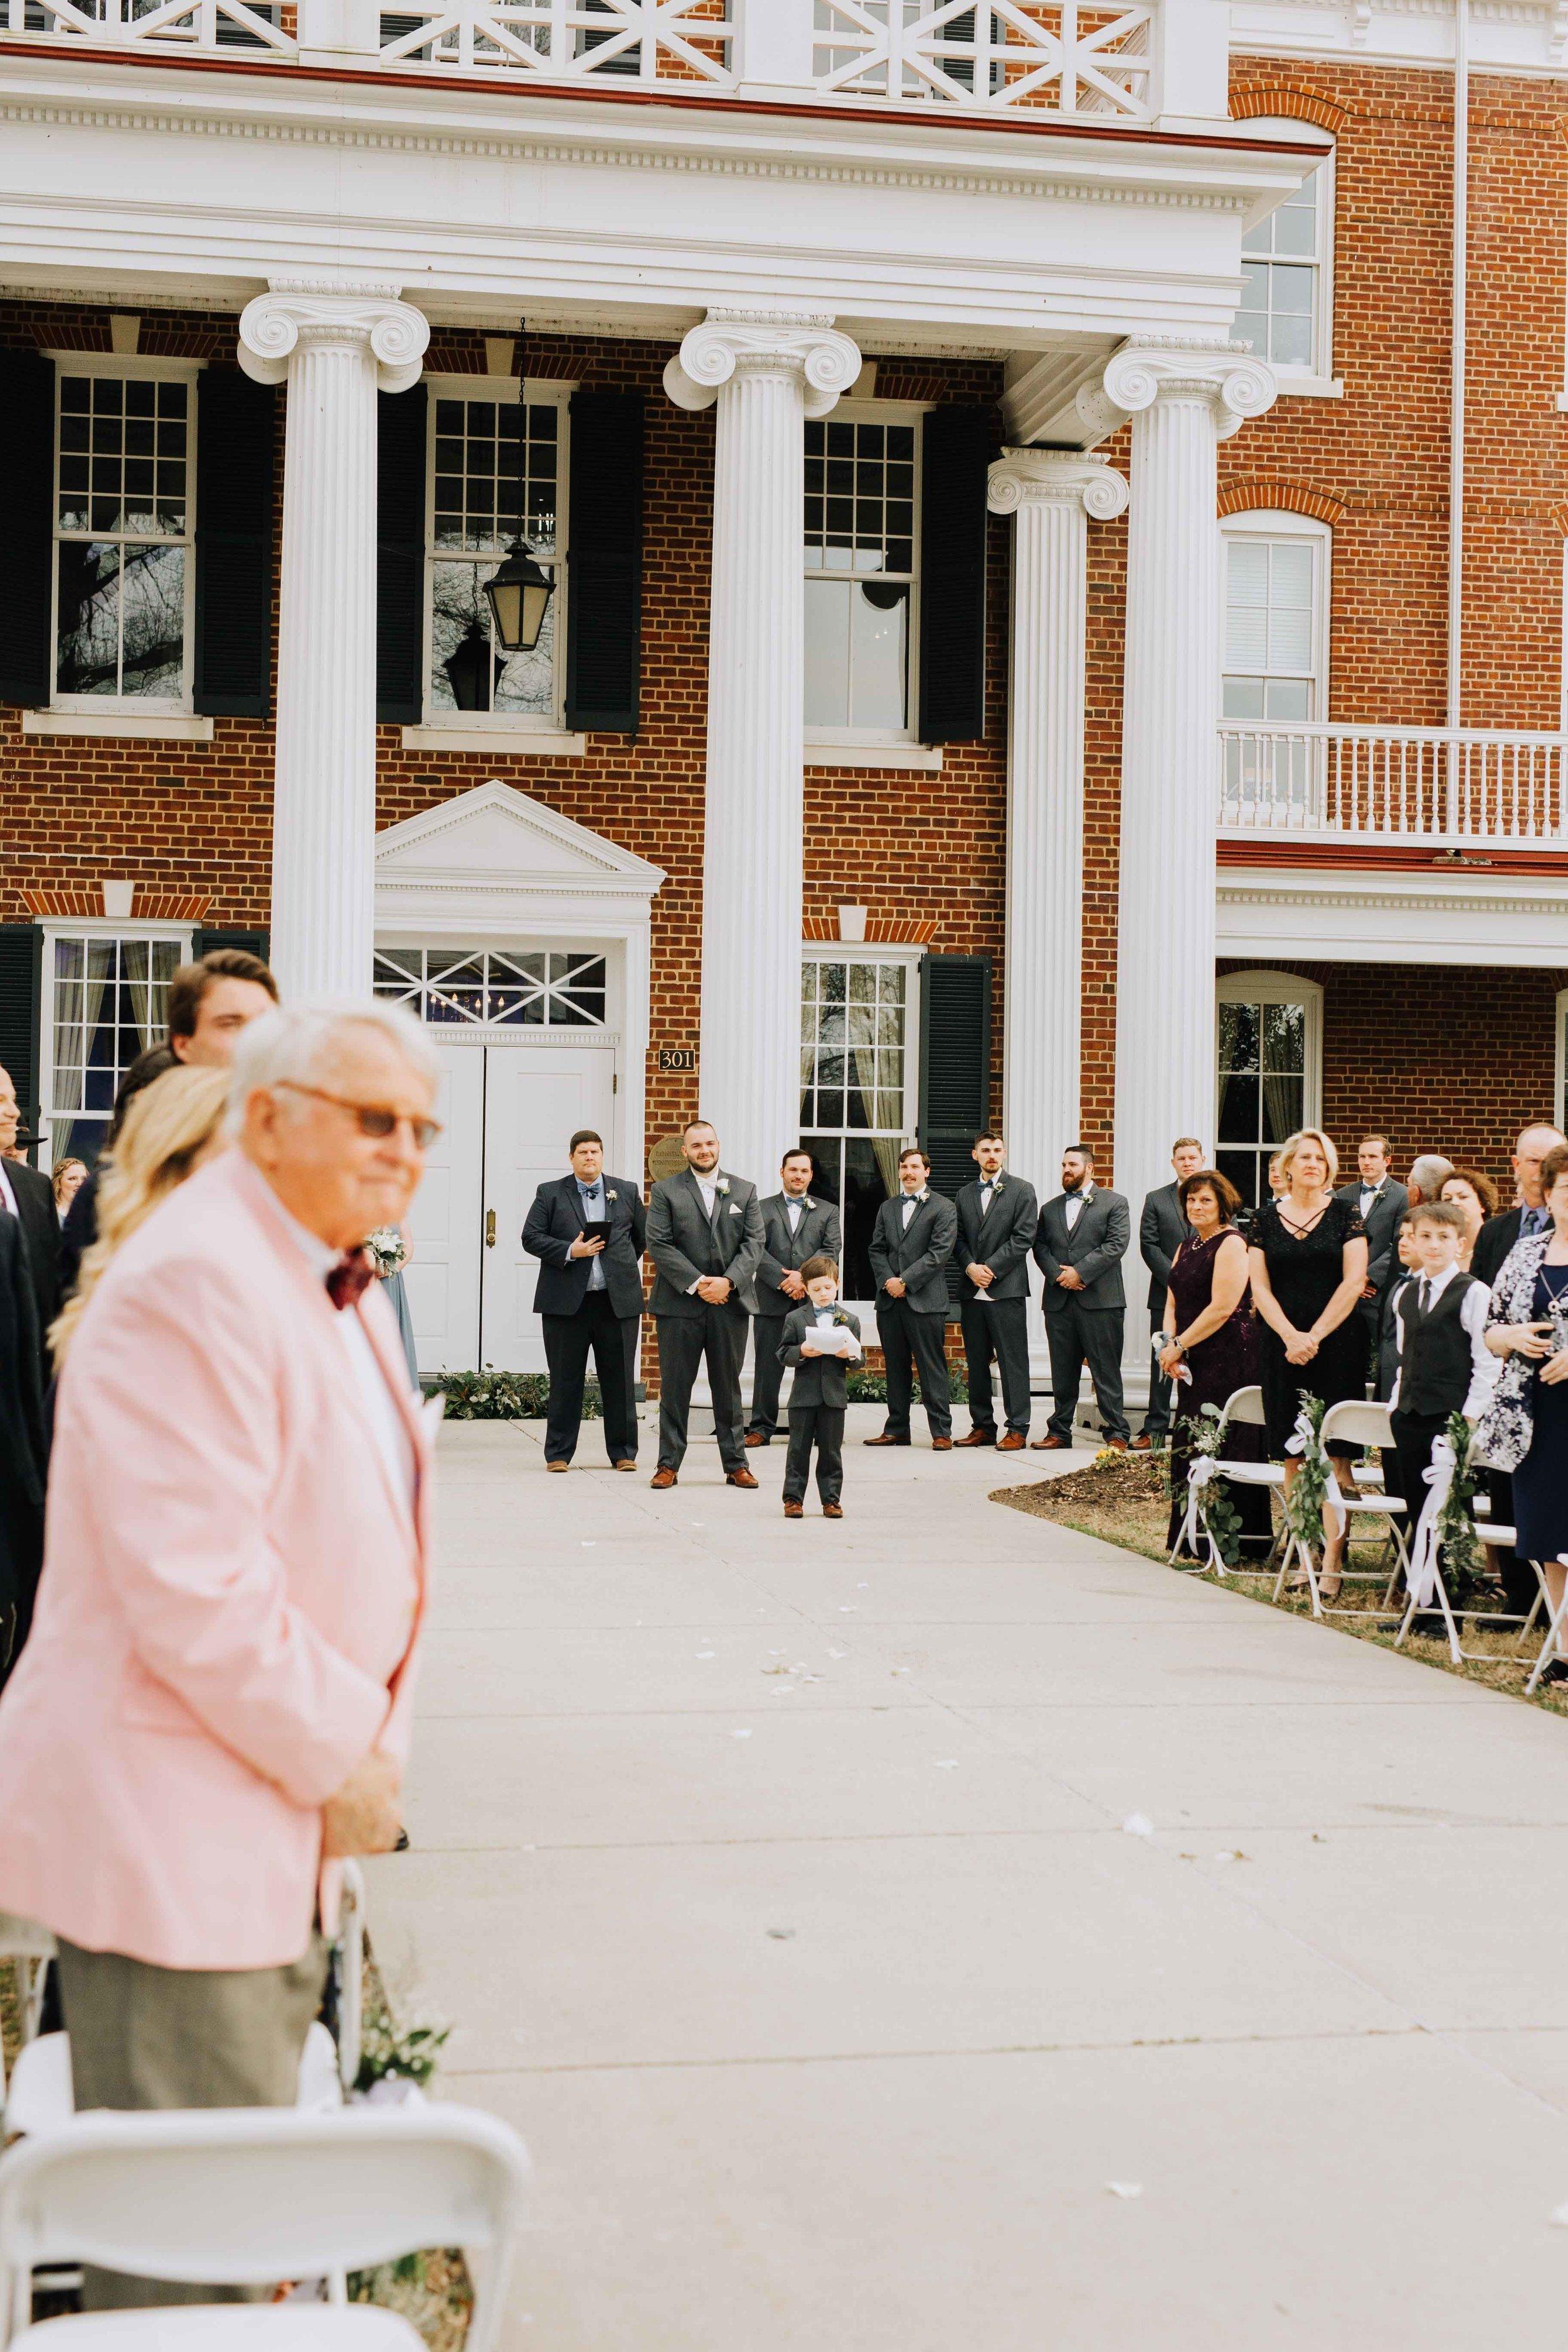 Farmville-Virginia-Wedding-Hotel-Weynoke-Downtown-Jacqueline-Waters-Photography-Detailed- (762).jpg